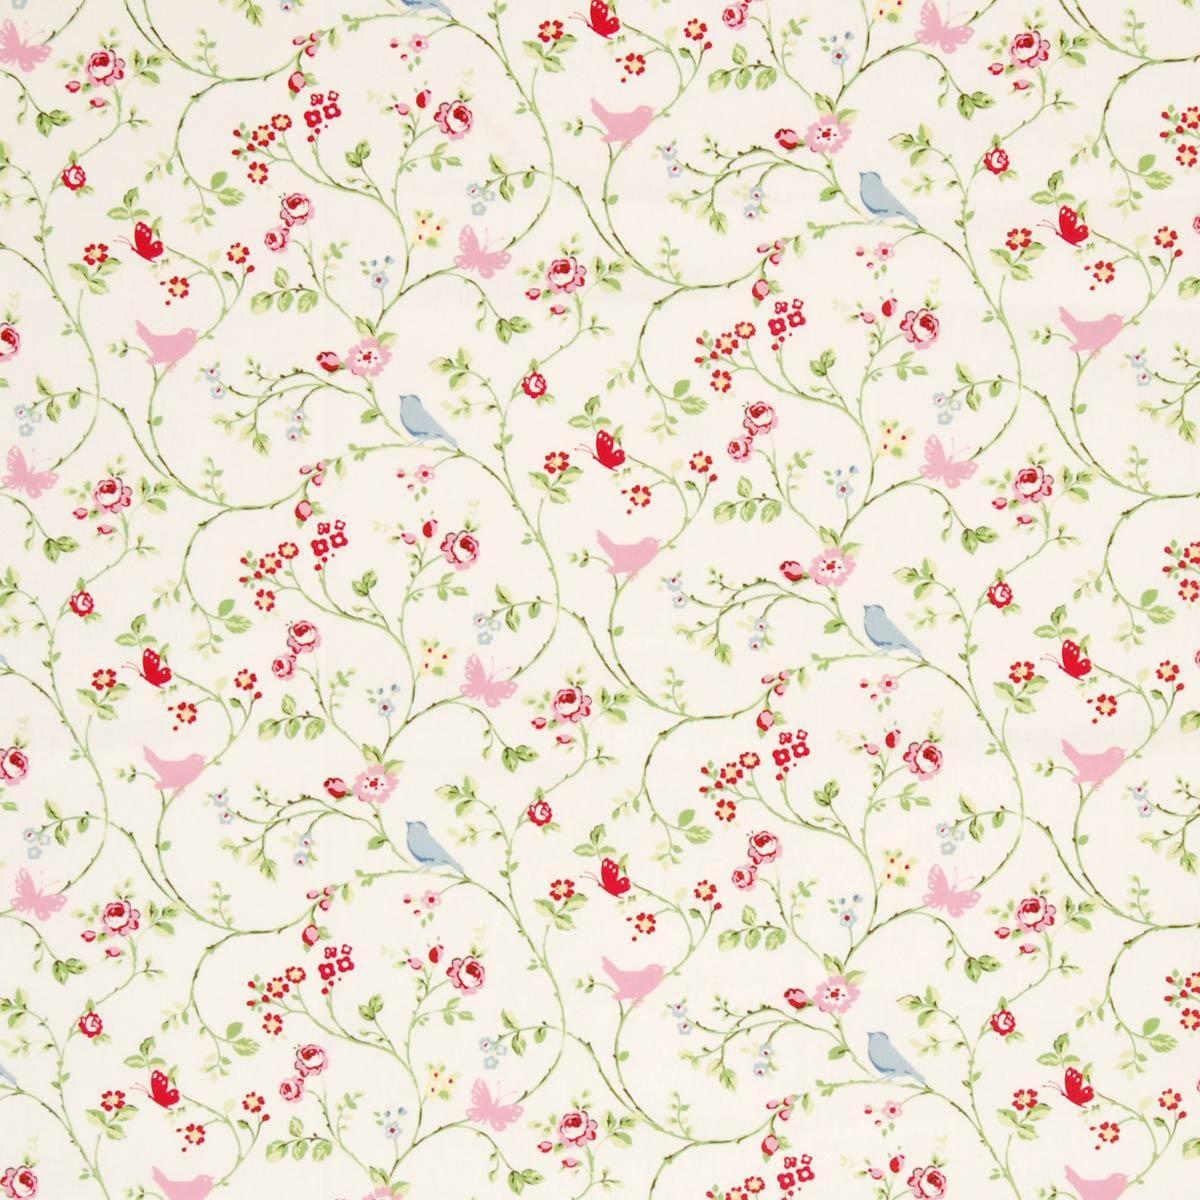 Kitchen Curtains Fabric Vintage Kitchen Fabric Chintz: Floral Curtains, Fabric Birds, Curtain Fabric